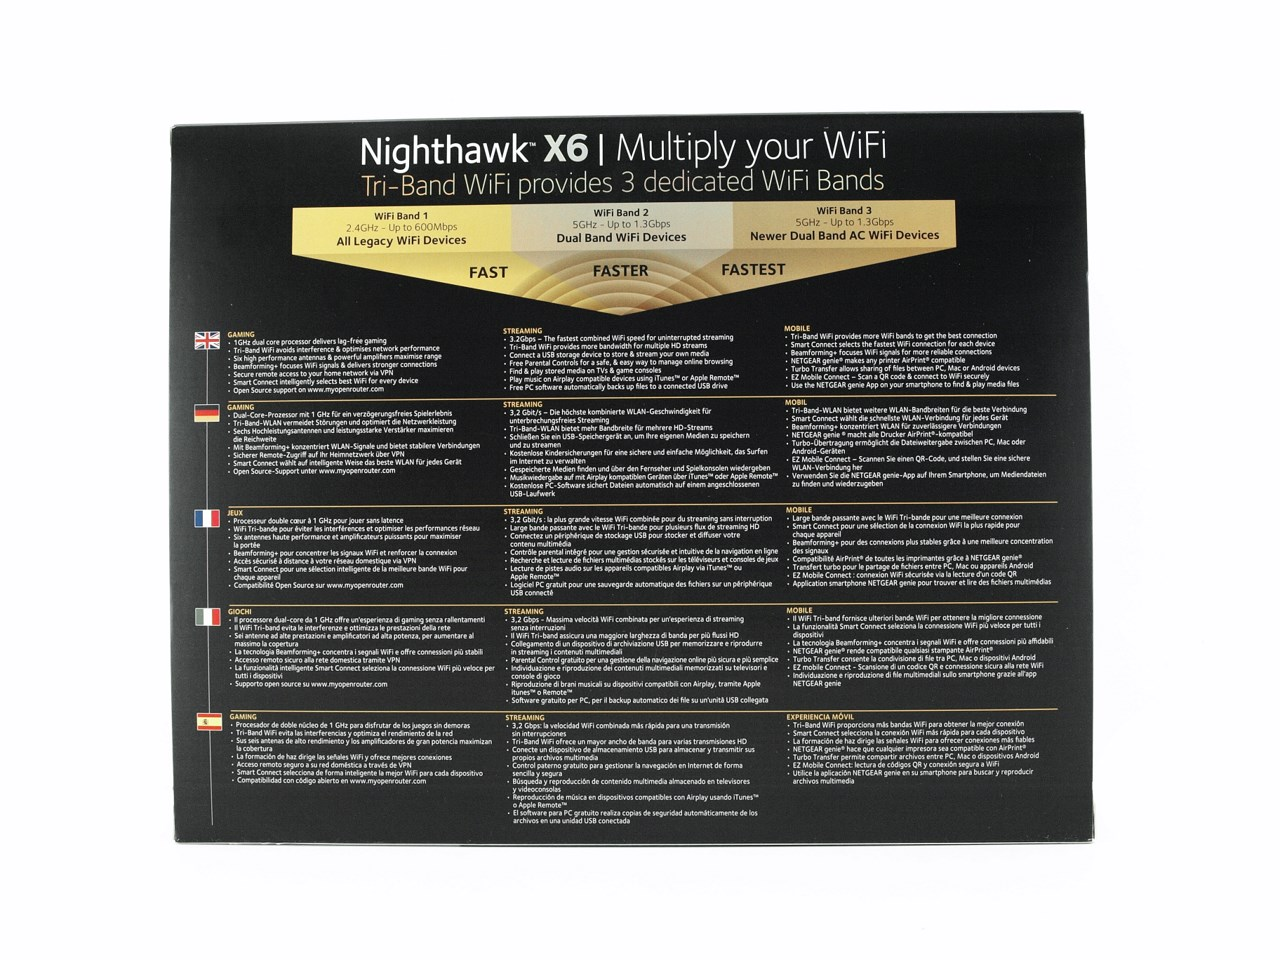 Netgear Nighthawk X6 R8000 AC3200 Tri-Band WiFi Router Review